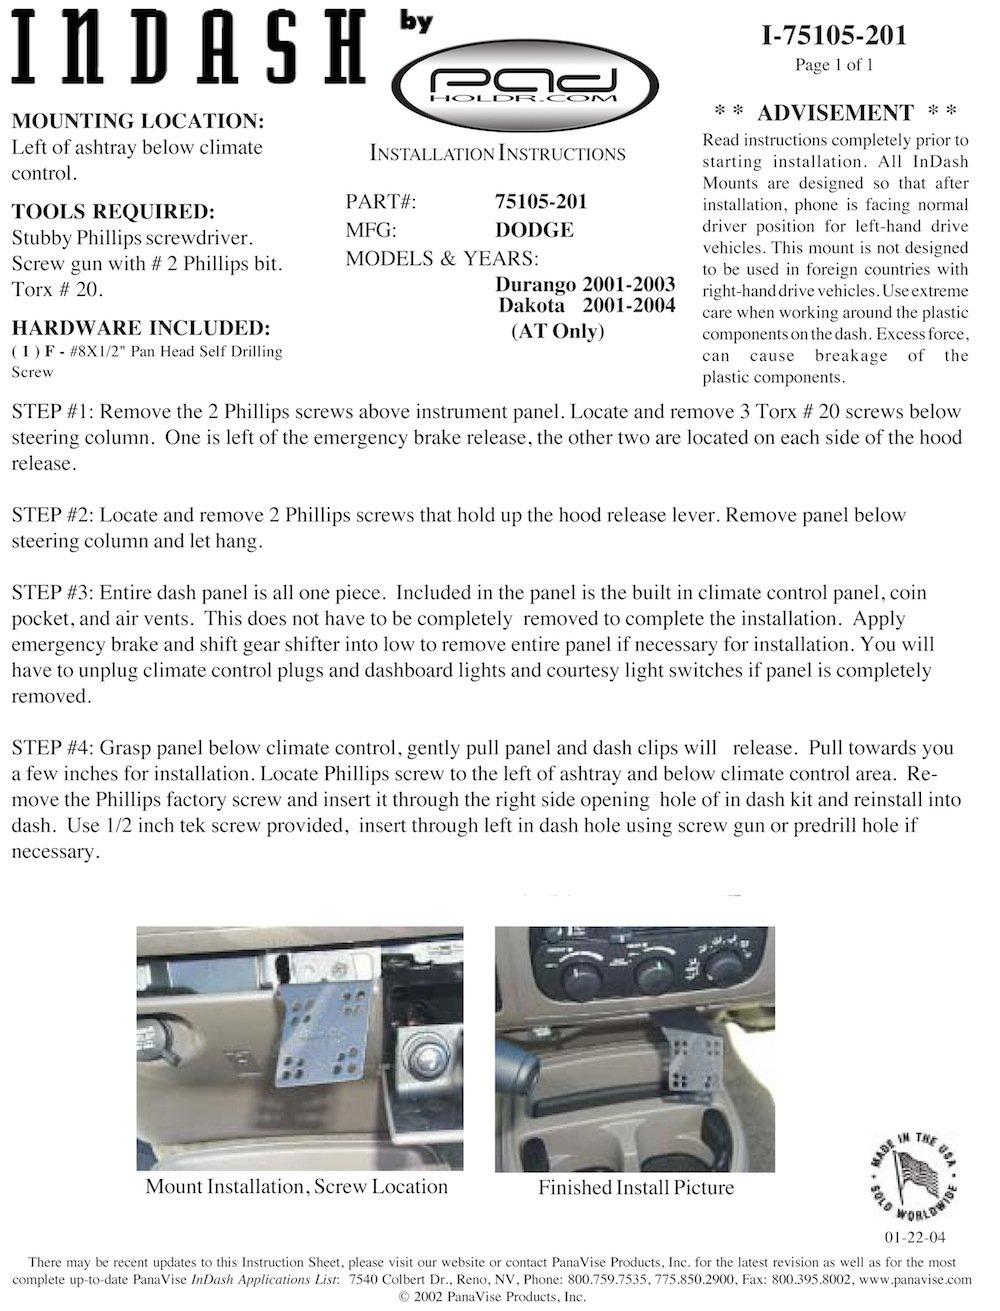 Padholdr Ram Series Spring Loaded Holder for 2001-2004 Dodge Dakota P//U AT and Durango AT Pad Holdr PHR75105-201